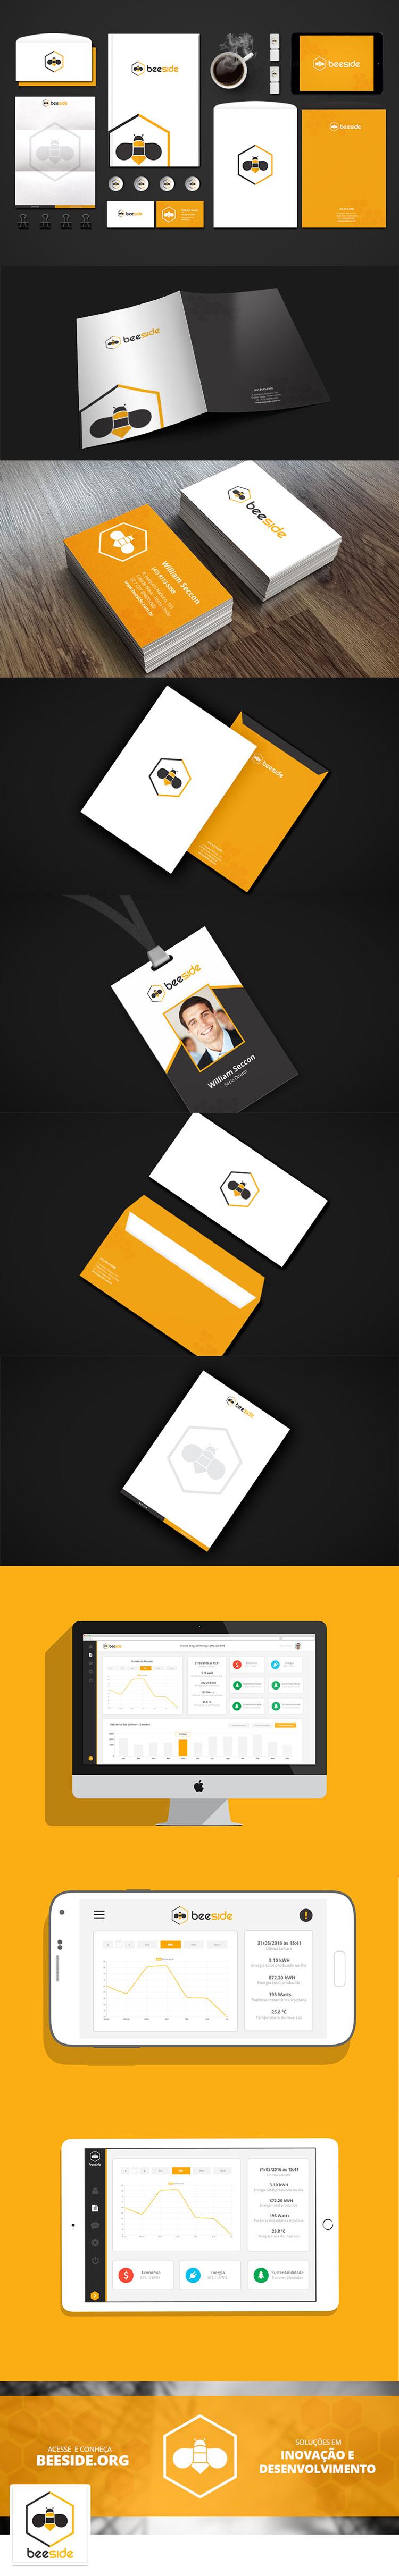 Identidade Visual Empresa Beeside